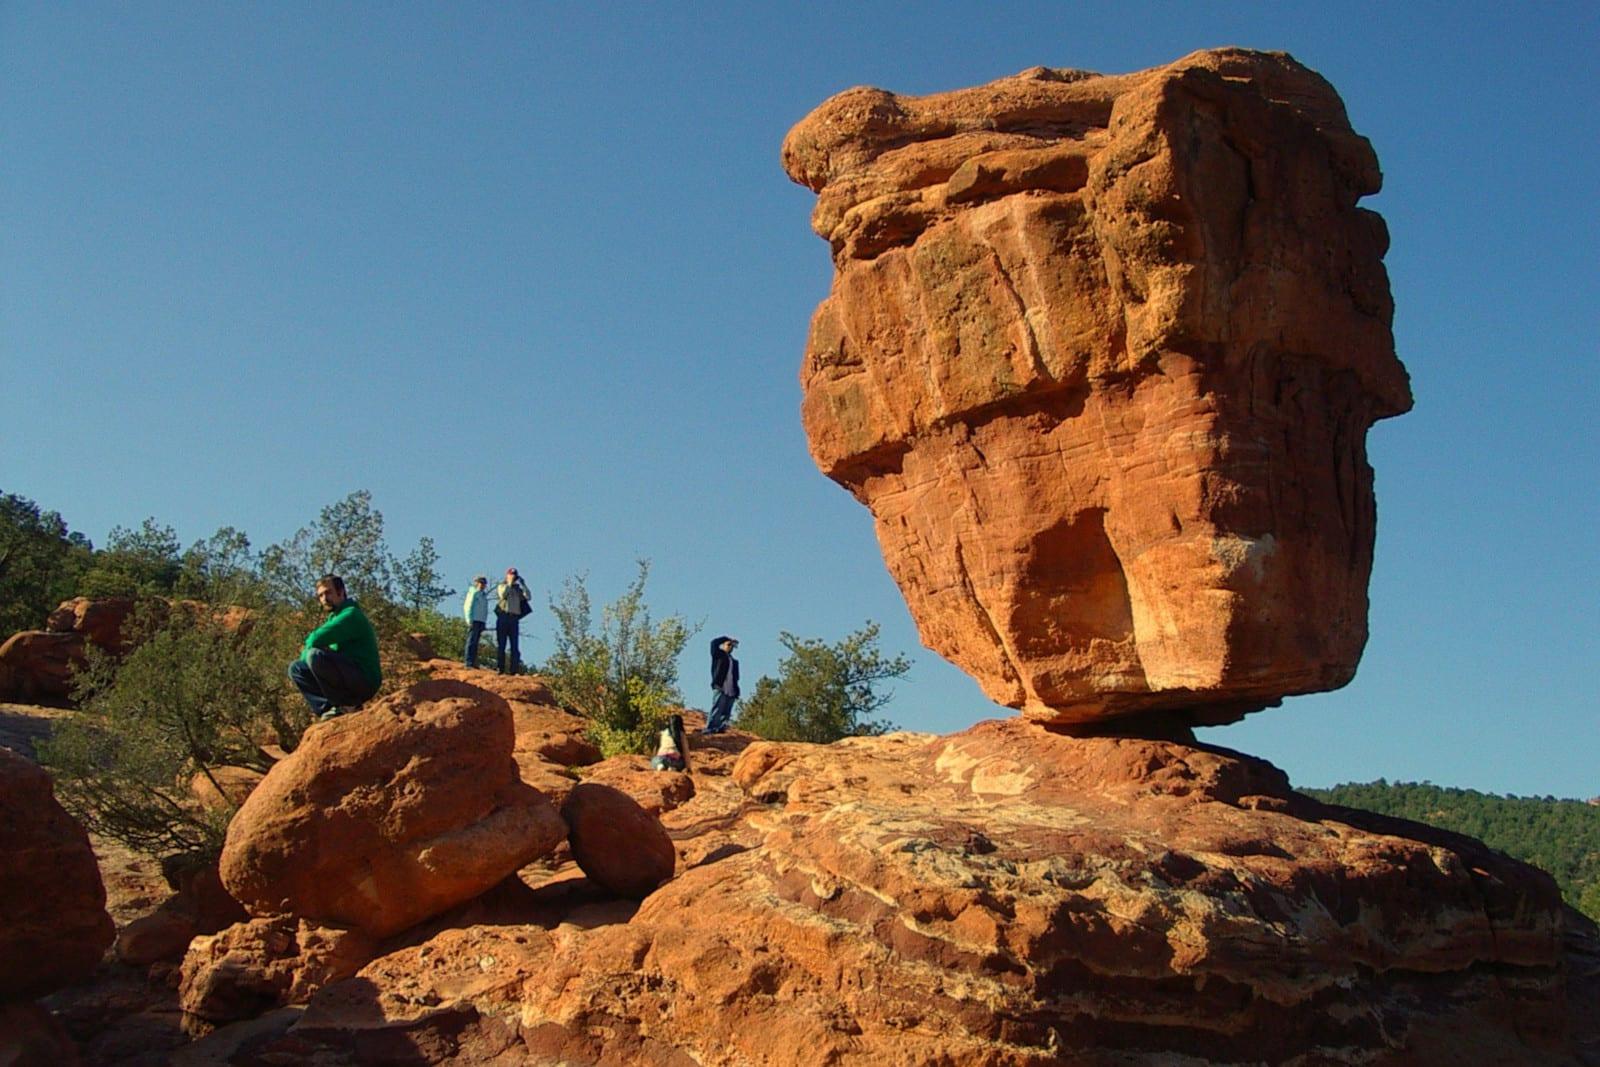 Colorado Educational Field Trip Garden of the Gods Balanced Rock